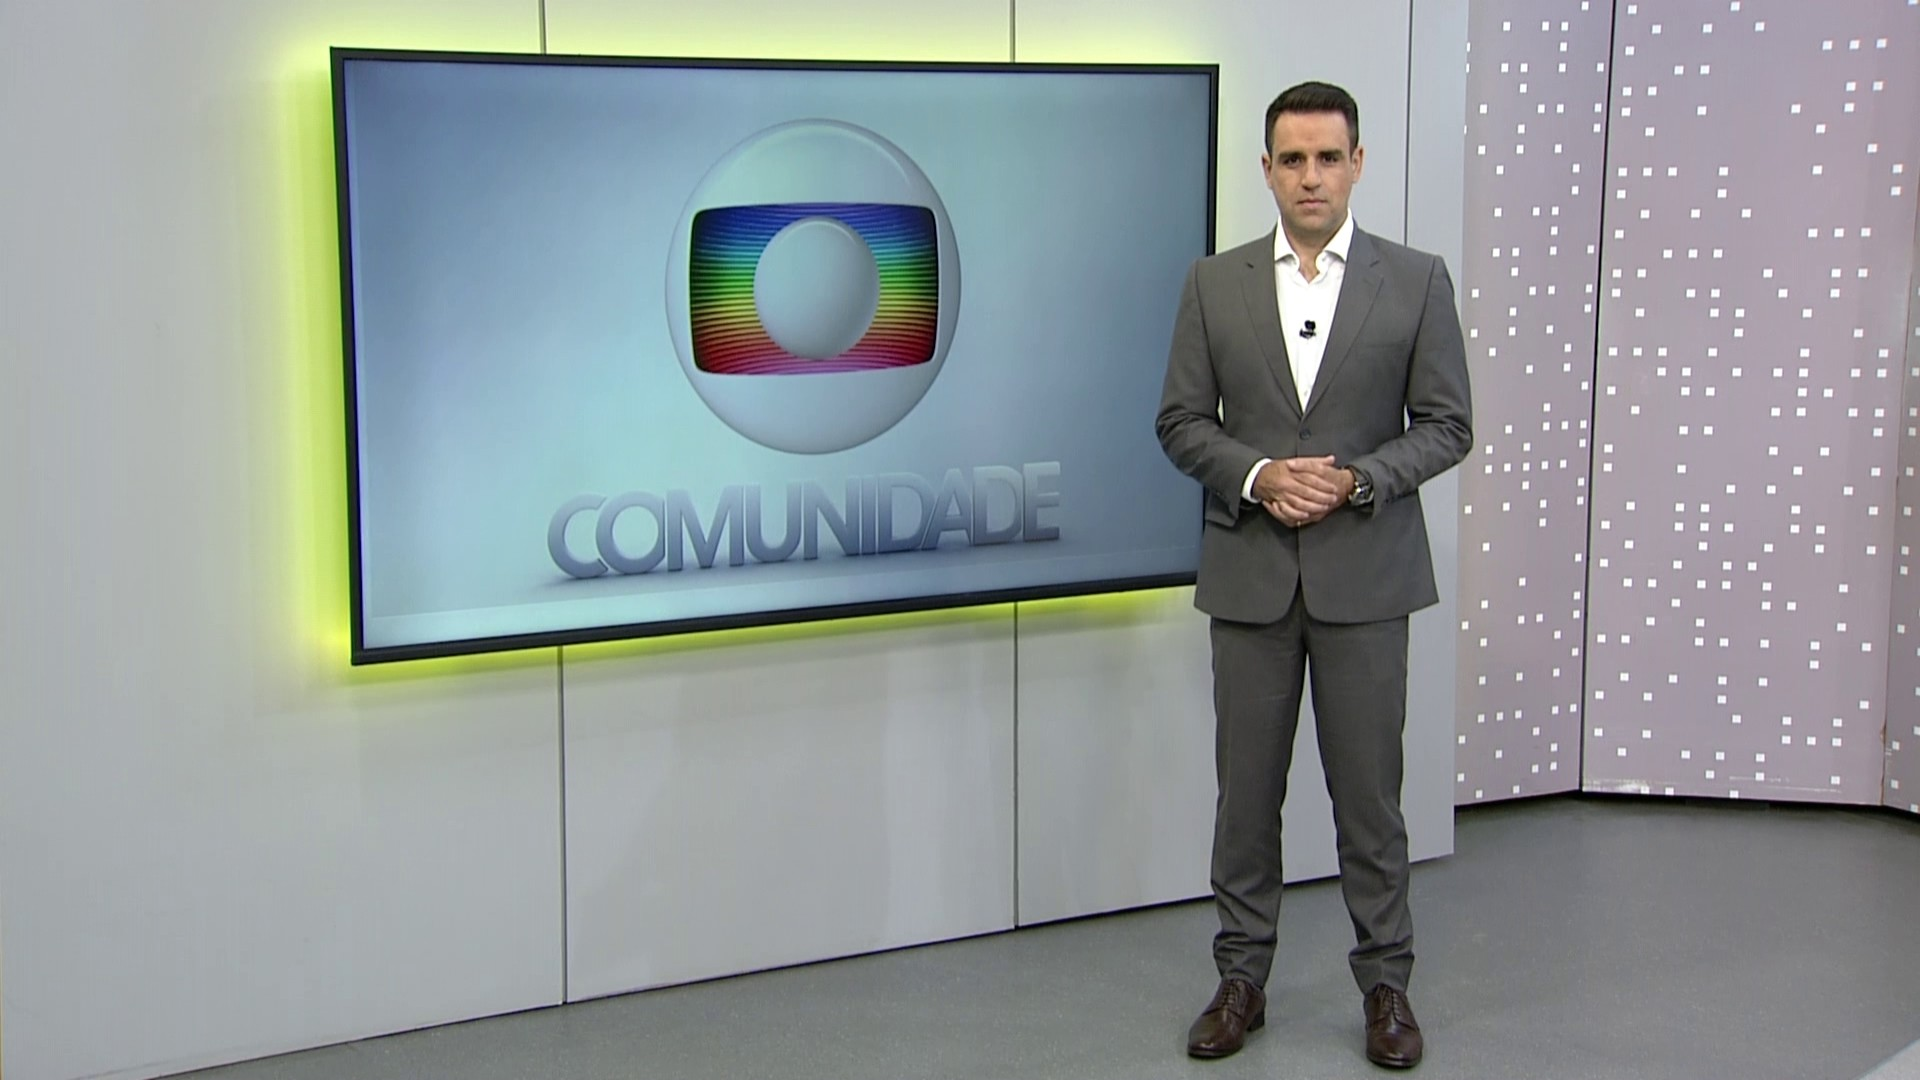 VÍDEOS: Globo Comunidade DF, 5 de julho